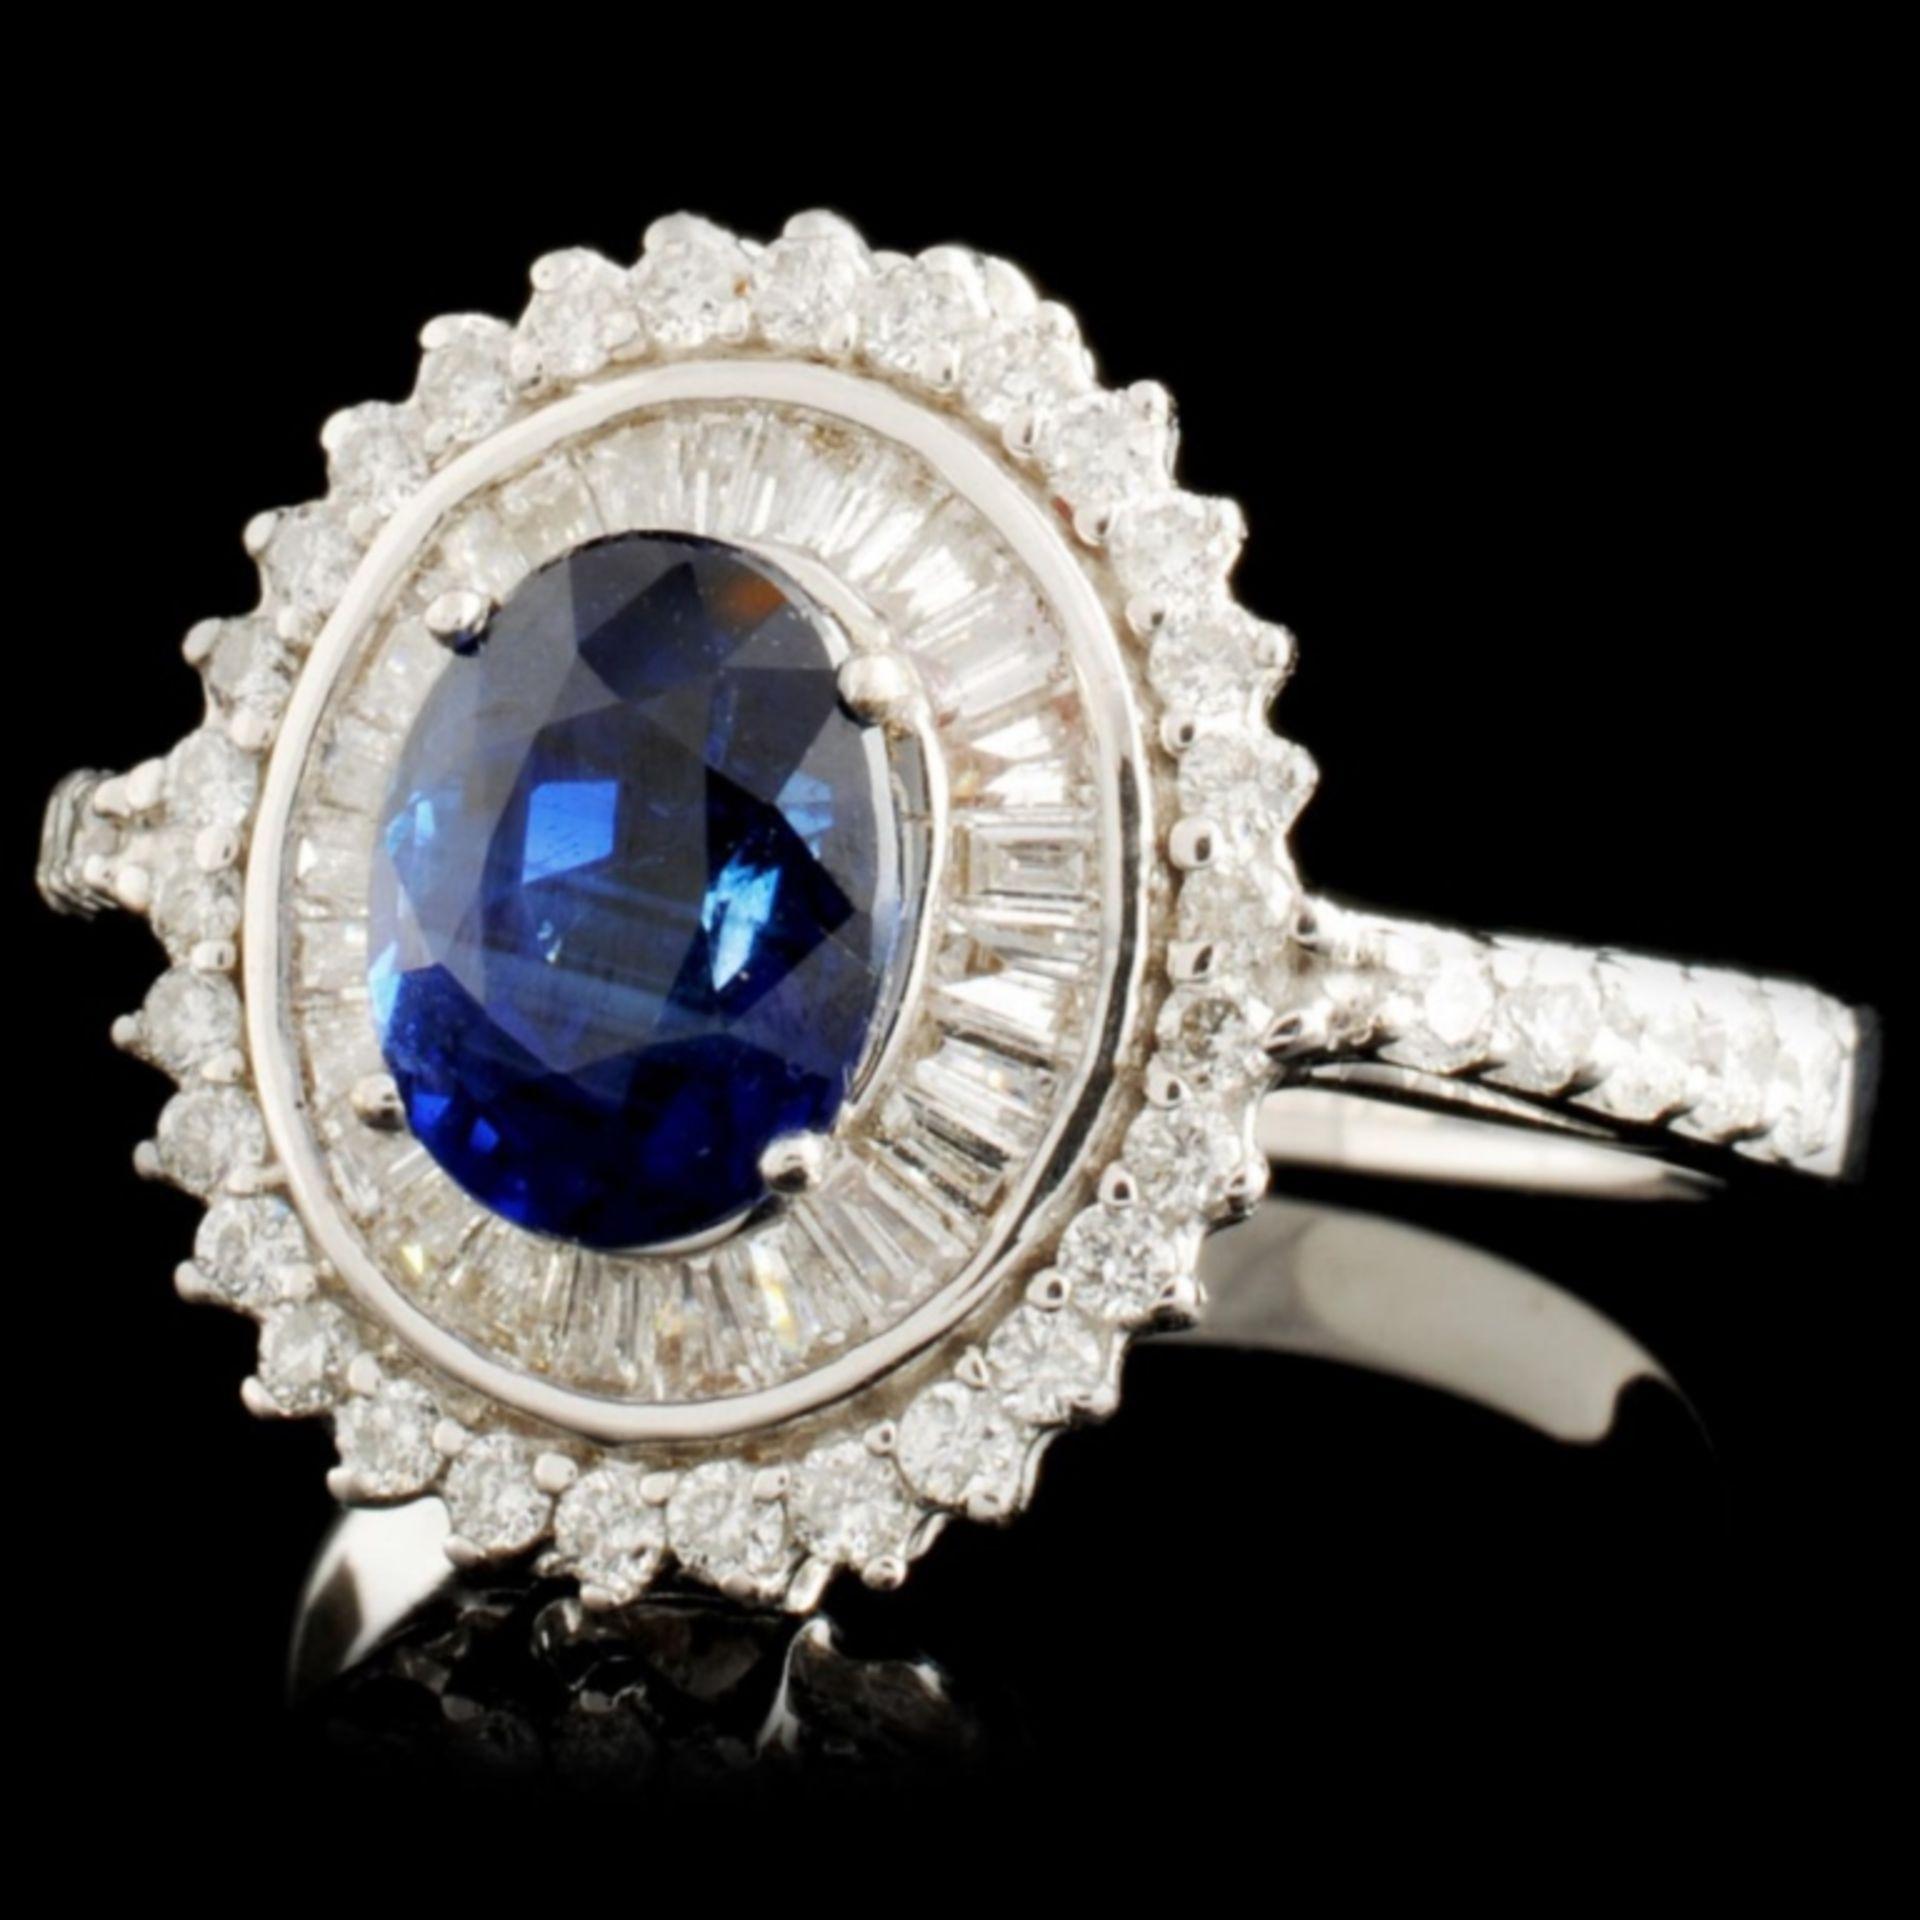 18K Gold 1.97ct Sapphire & 0.78ctw Diamond Ring - Image 2 of 3